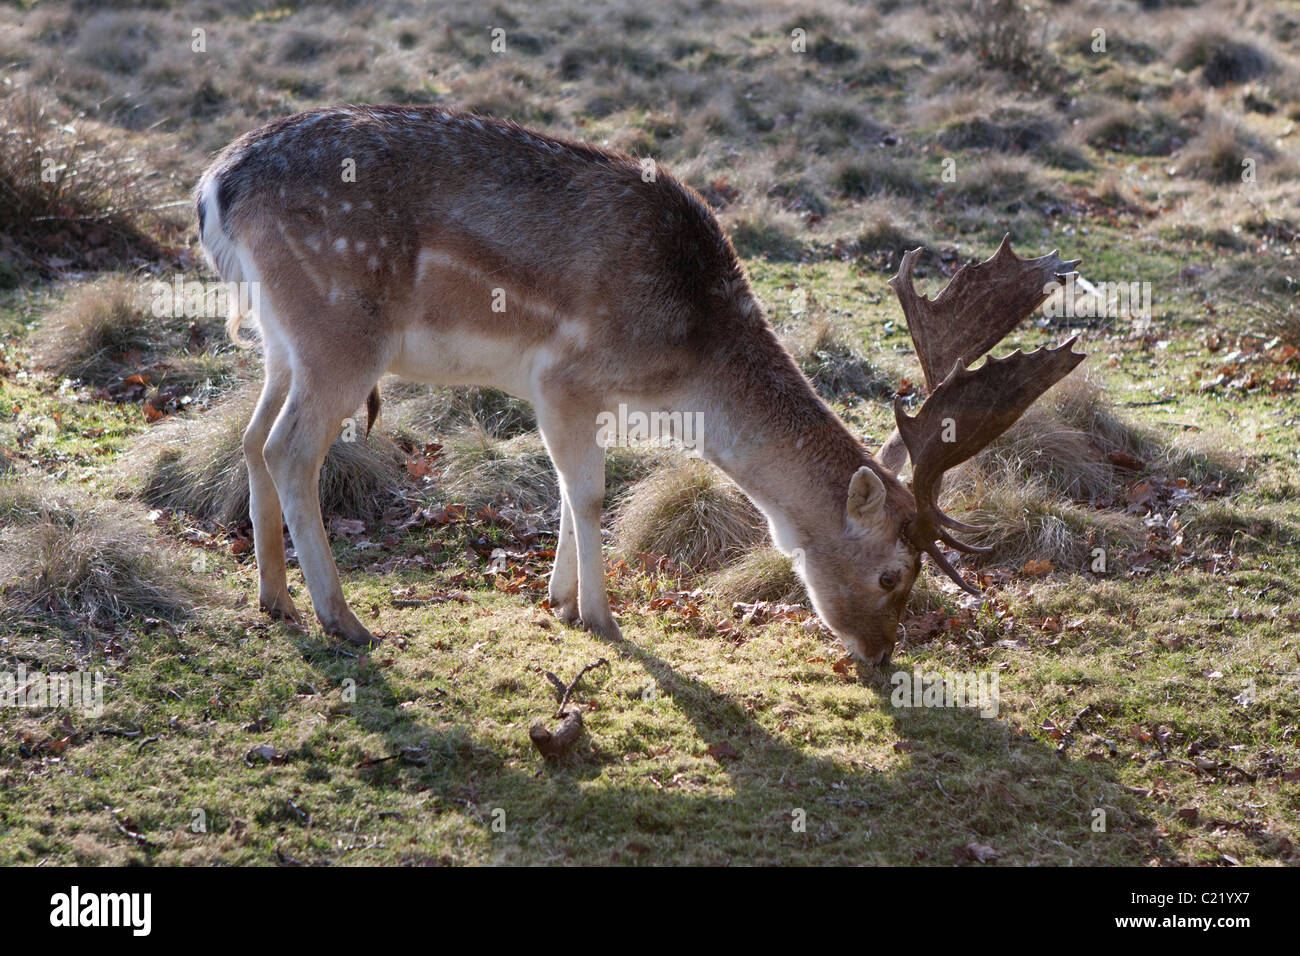 Deer at Dunham Massey in Cheshire, England. © StockPix.eu - Stock Image